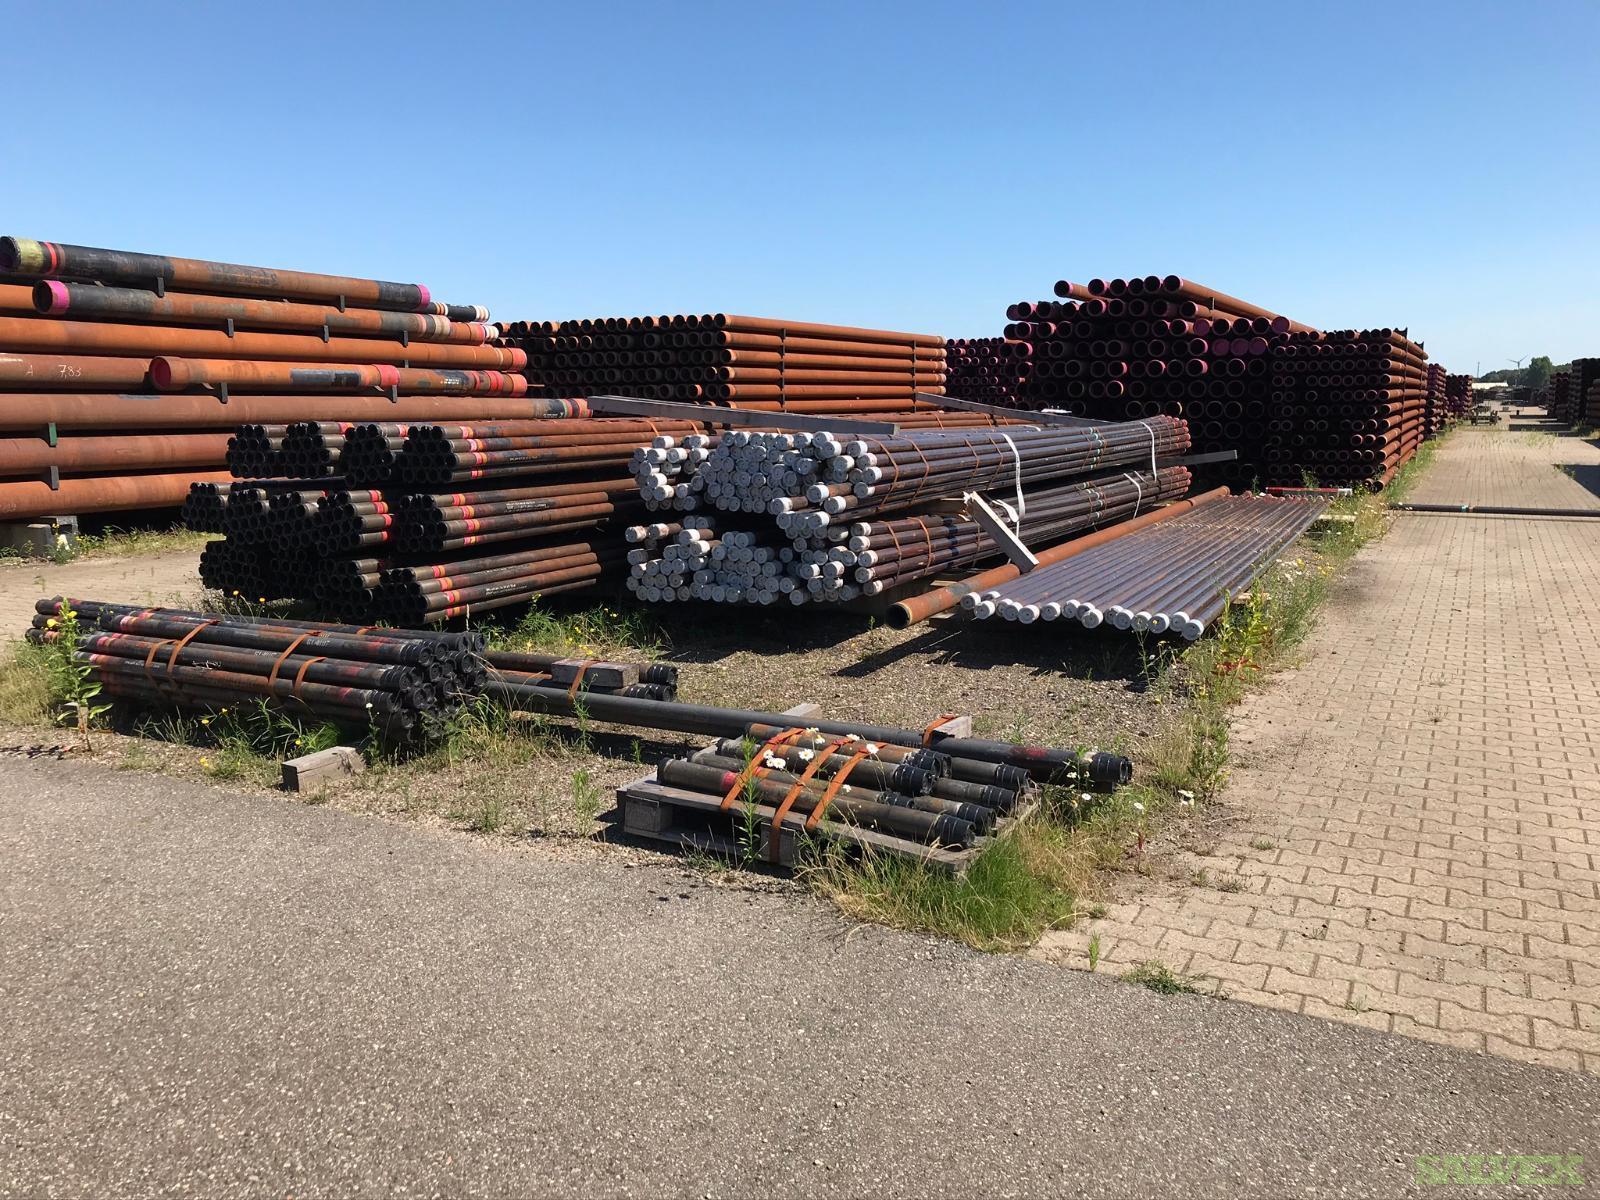 4 1/2 12.60# 26CR J55 Techniseal R2 Surplus Tubing (207 Feet / 1 Metric Tons)